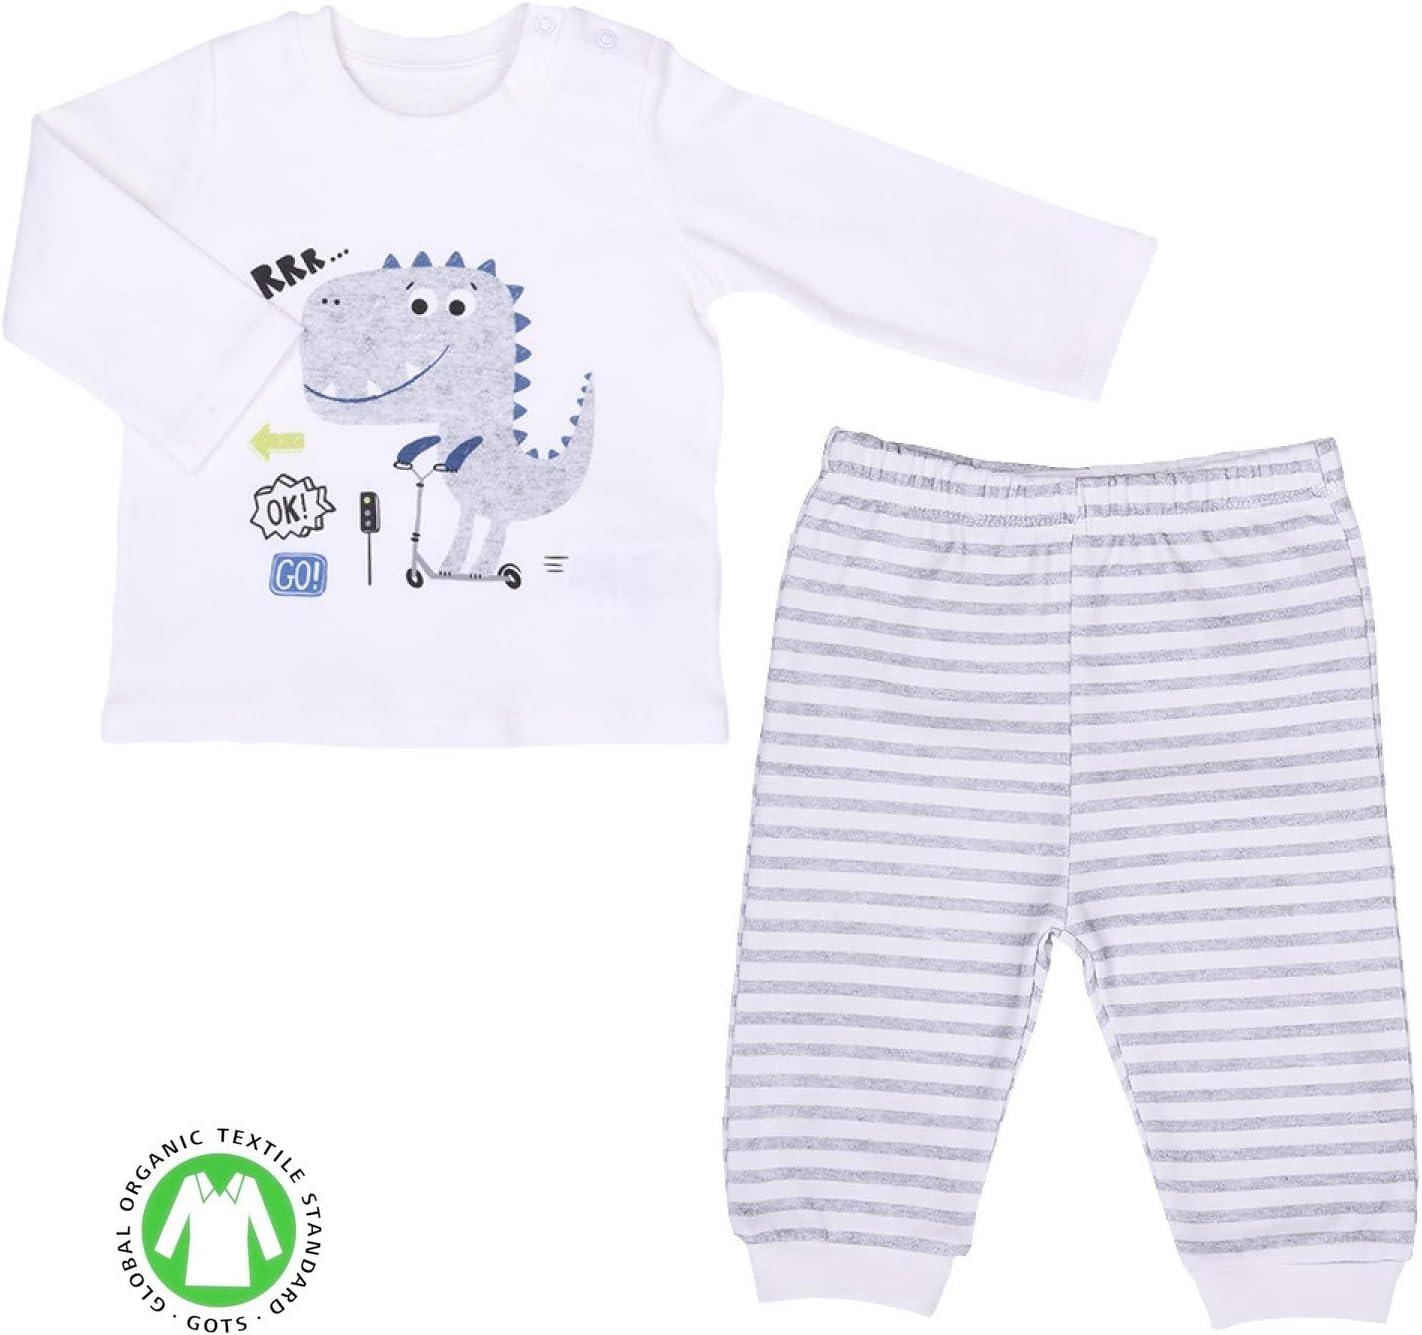 pyjama 2 pi/èces Ensemble v/êtements B/éb/é en coton biologique Dino Trafic Sevira Kids